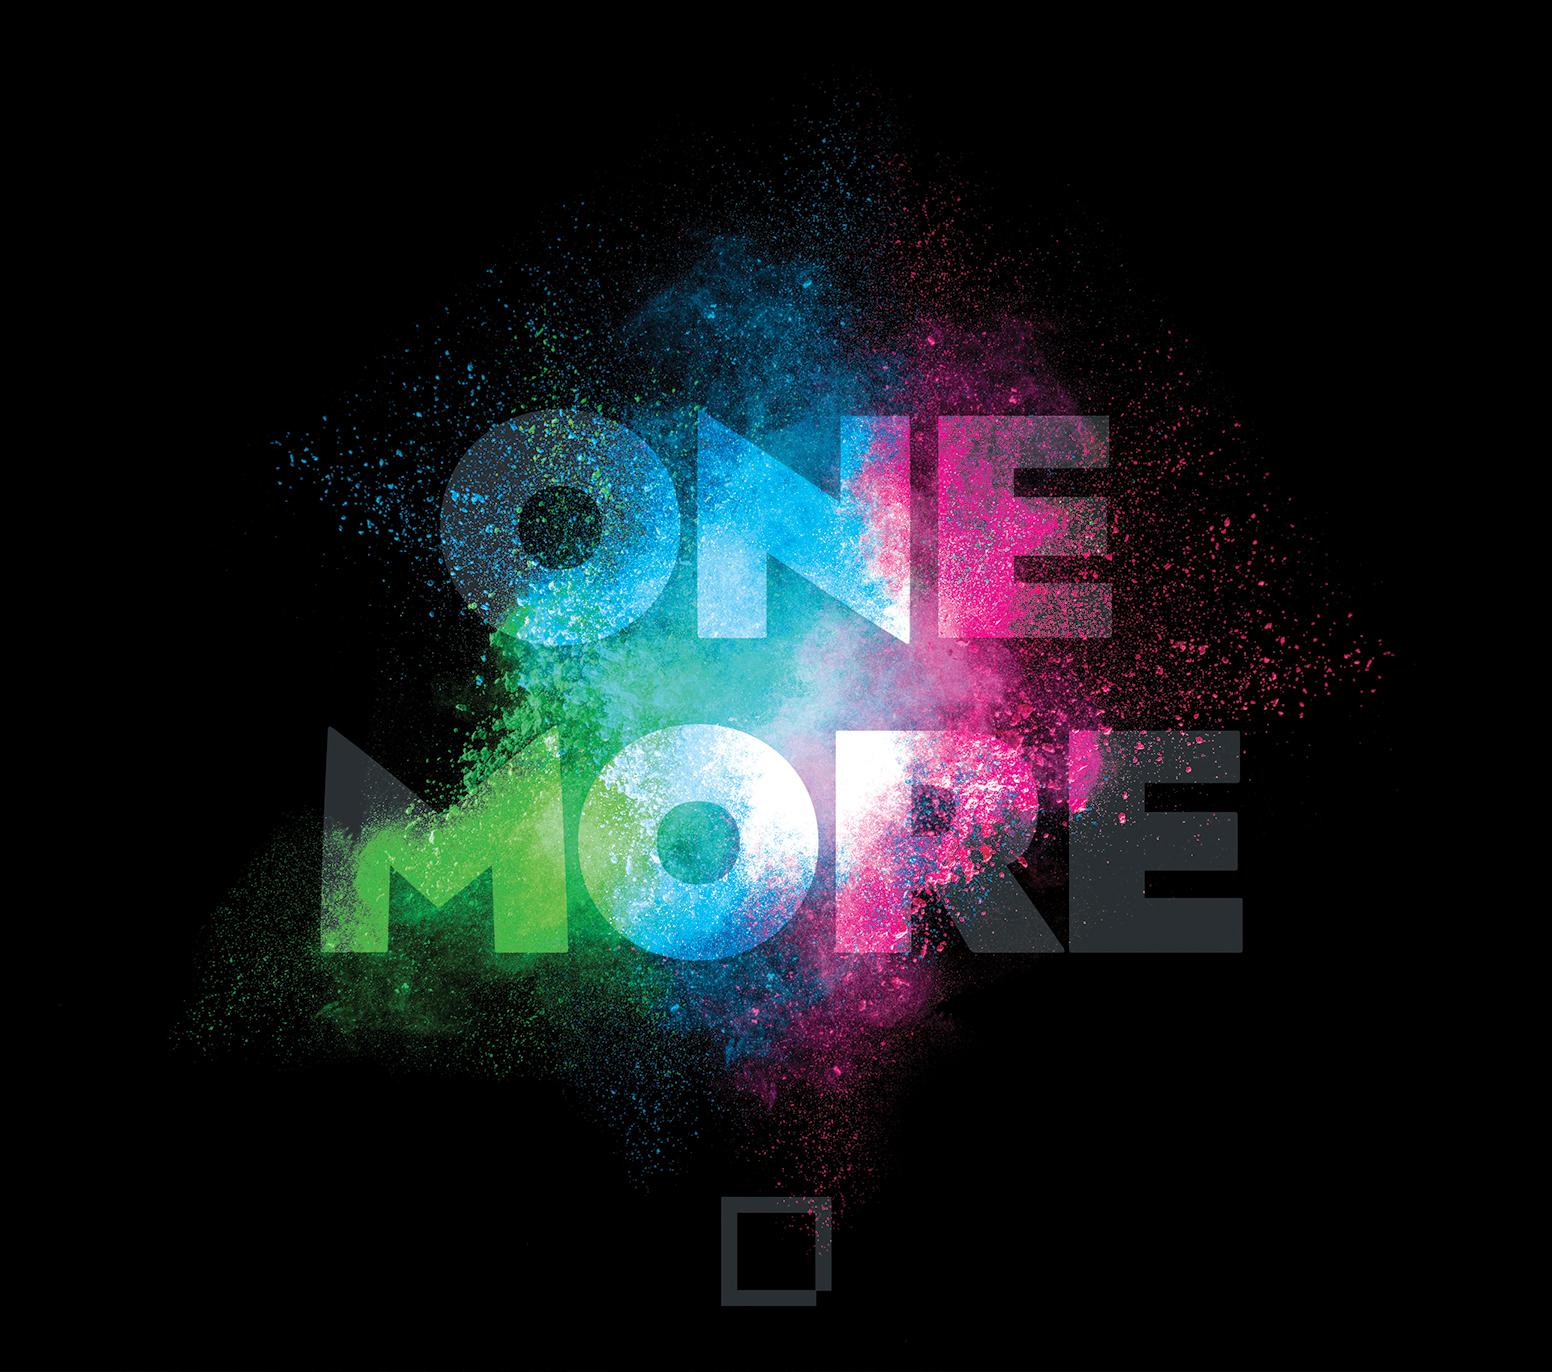 1 More Than 2 1 More Than 2: Cornerstone Church